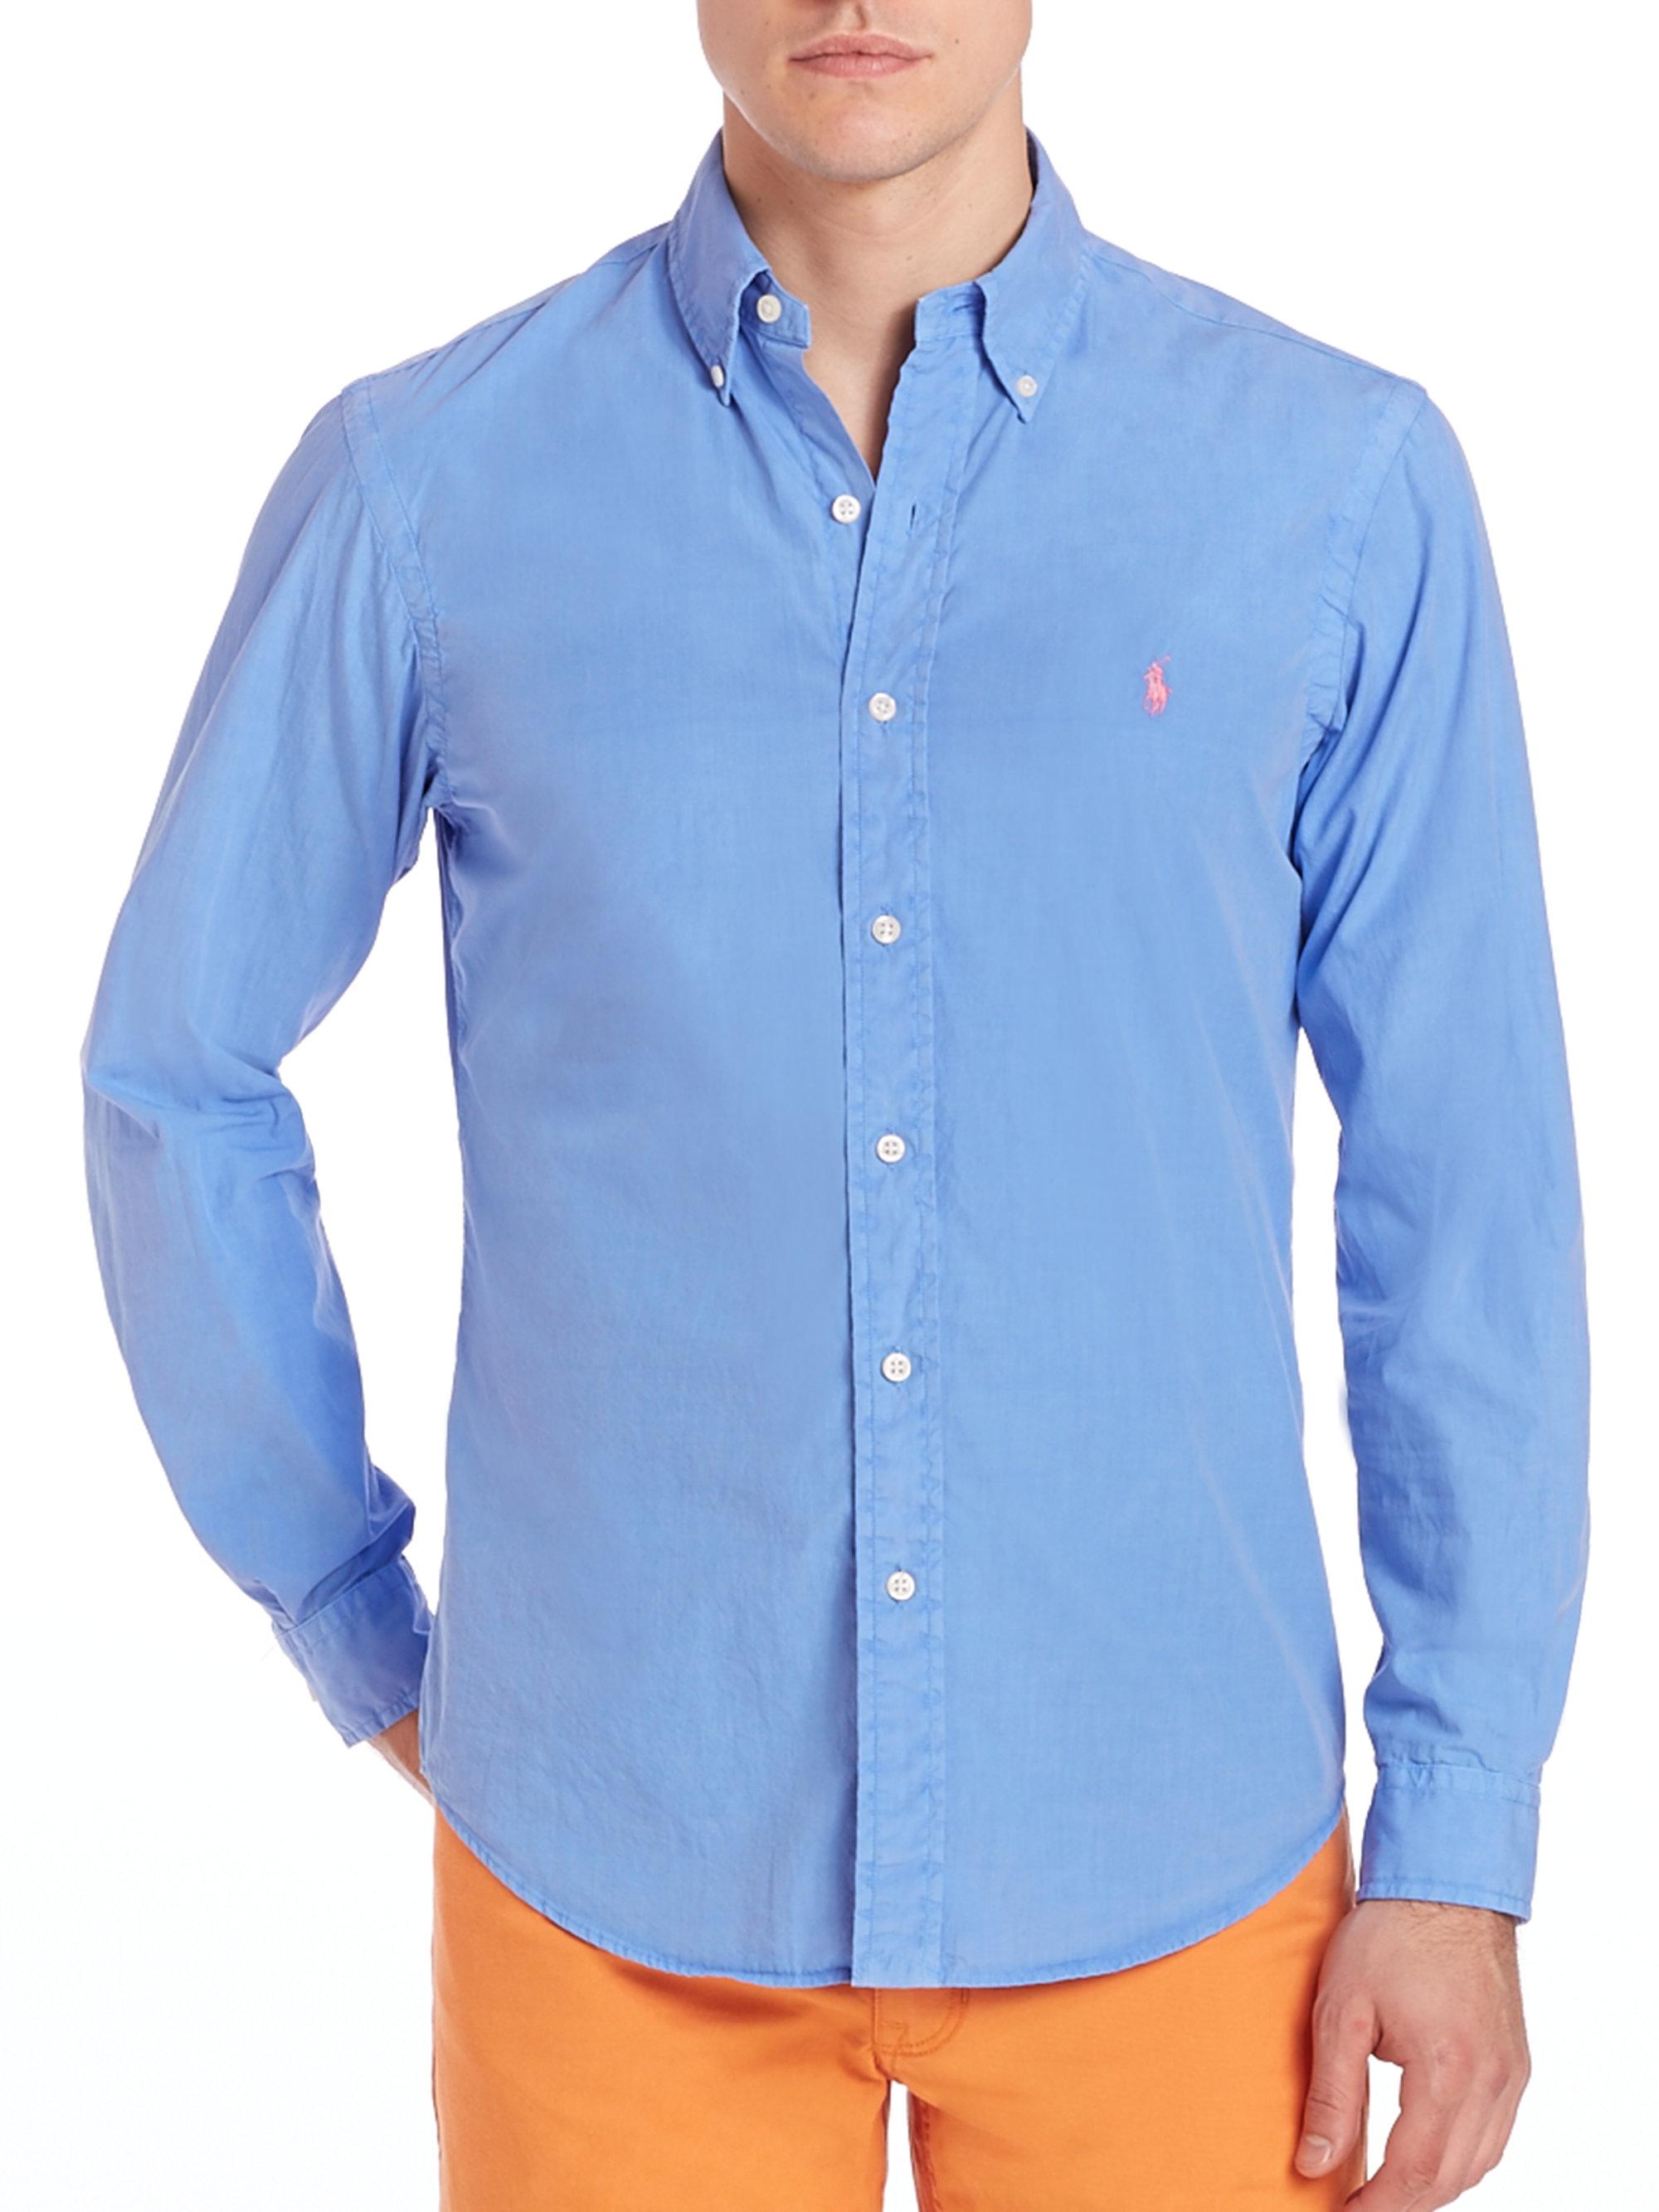 Polo ralph lauren Poplin Button up in Blue for Men Lyst f5eab95afe0